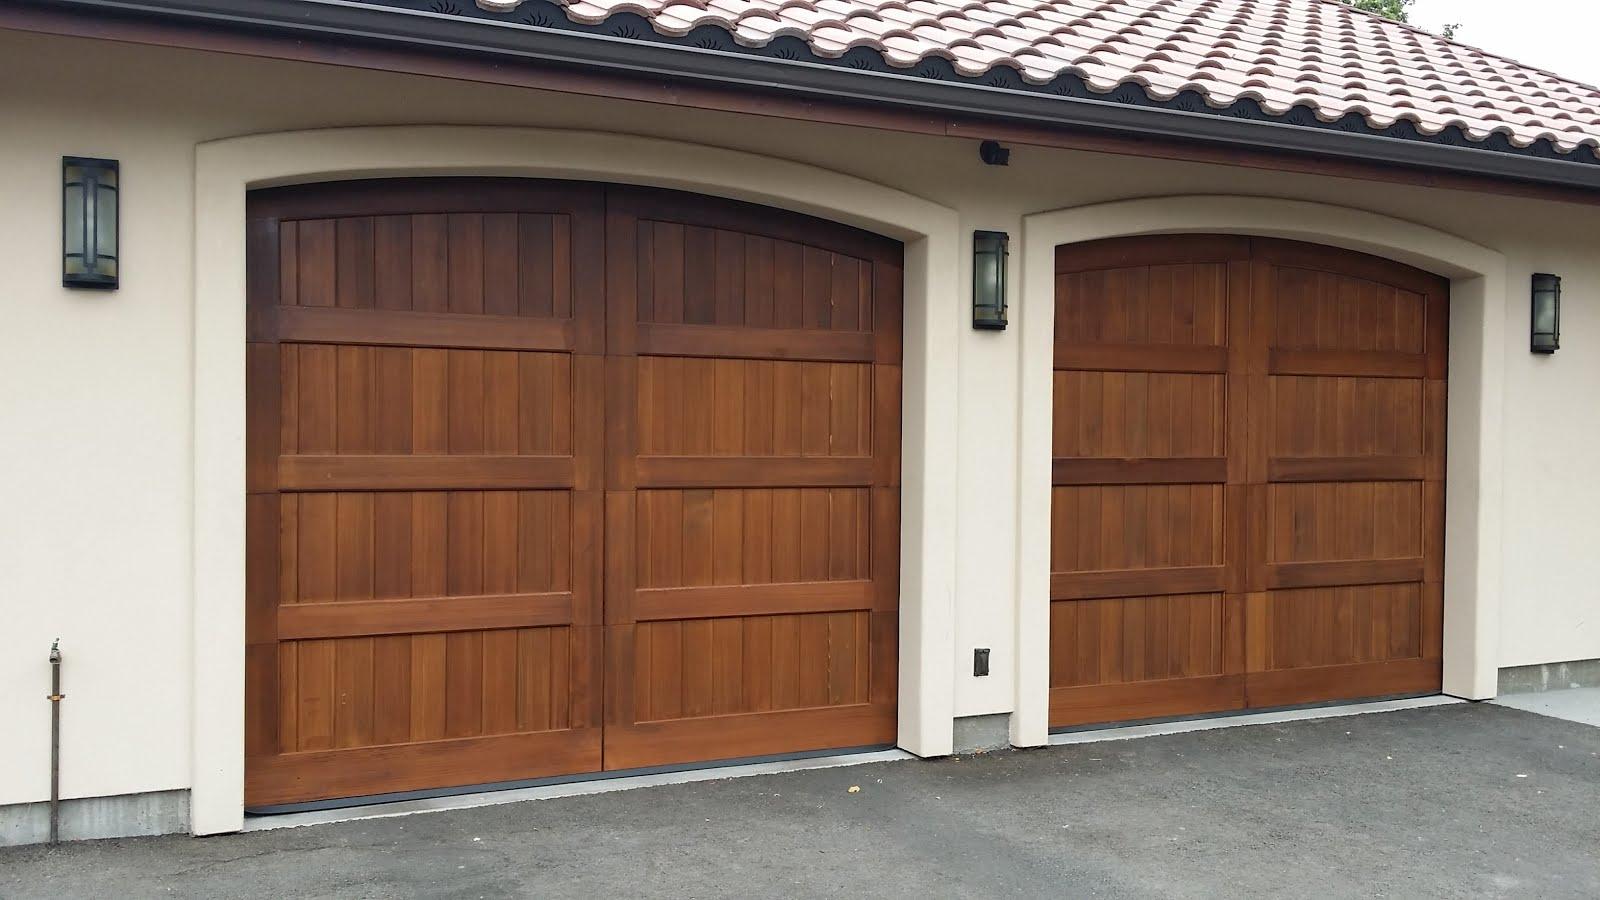 North Bay Carriage House Garage Door Installation